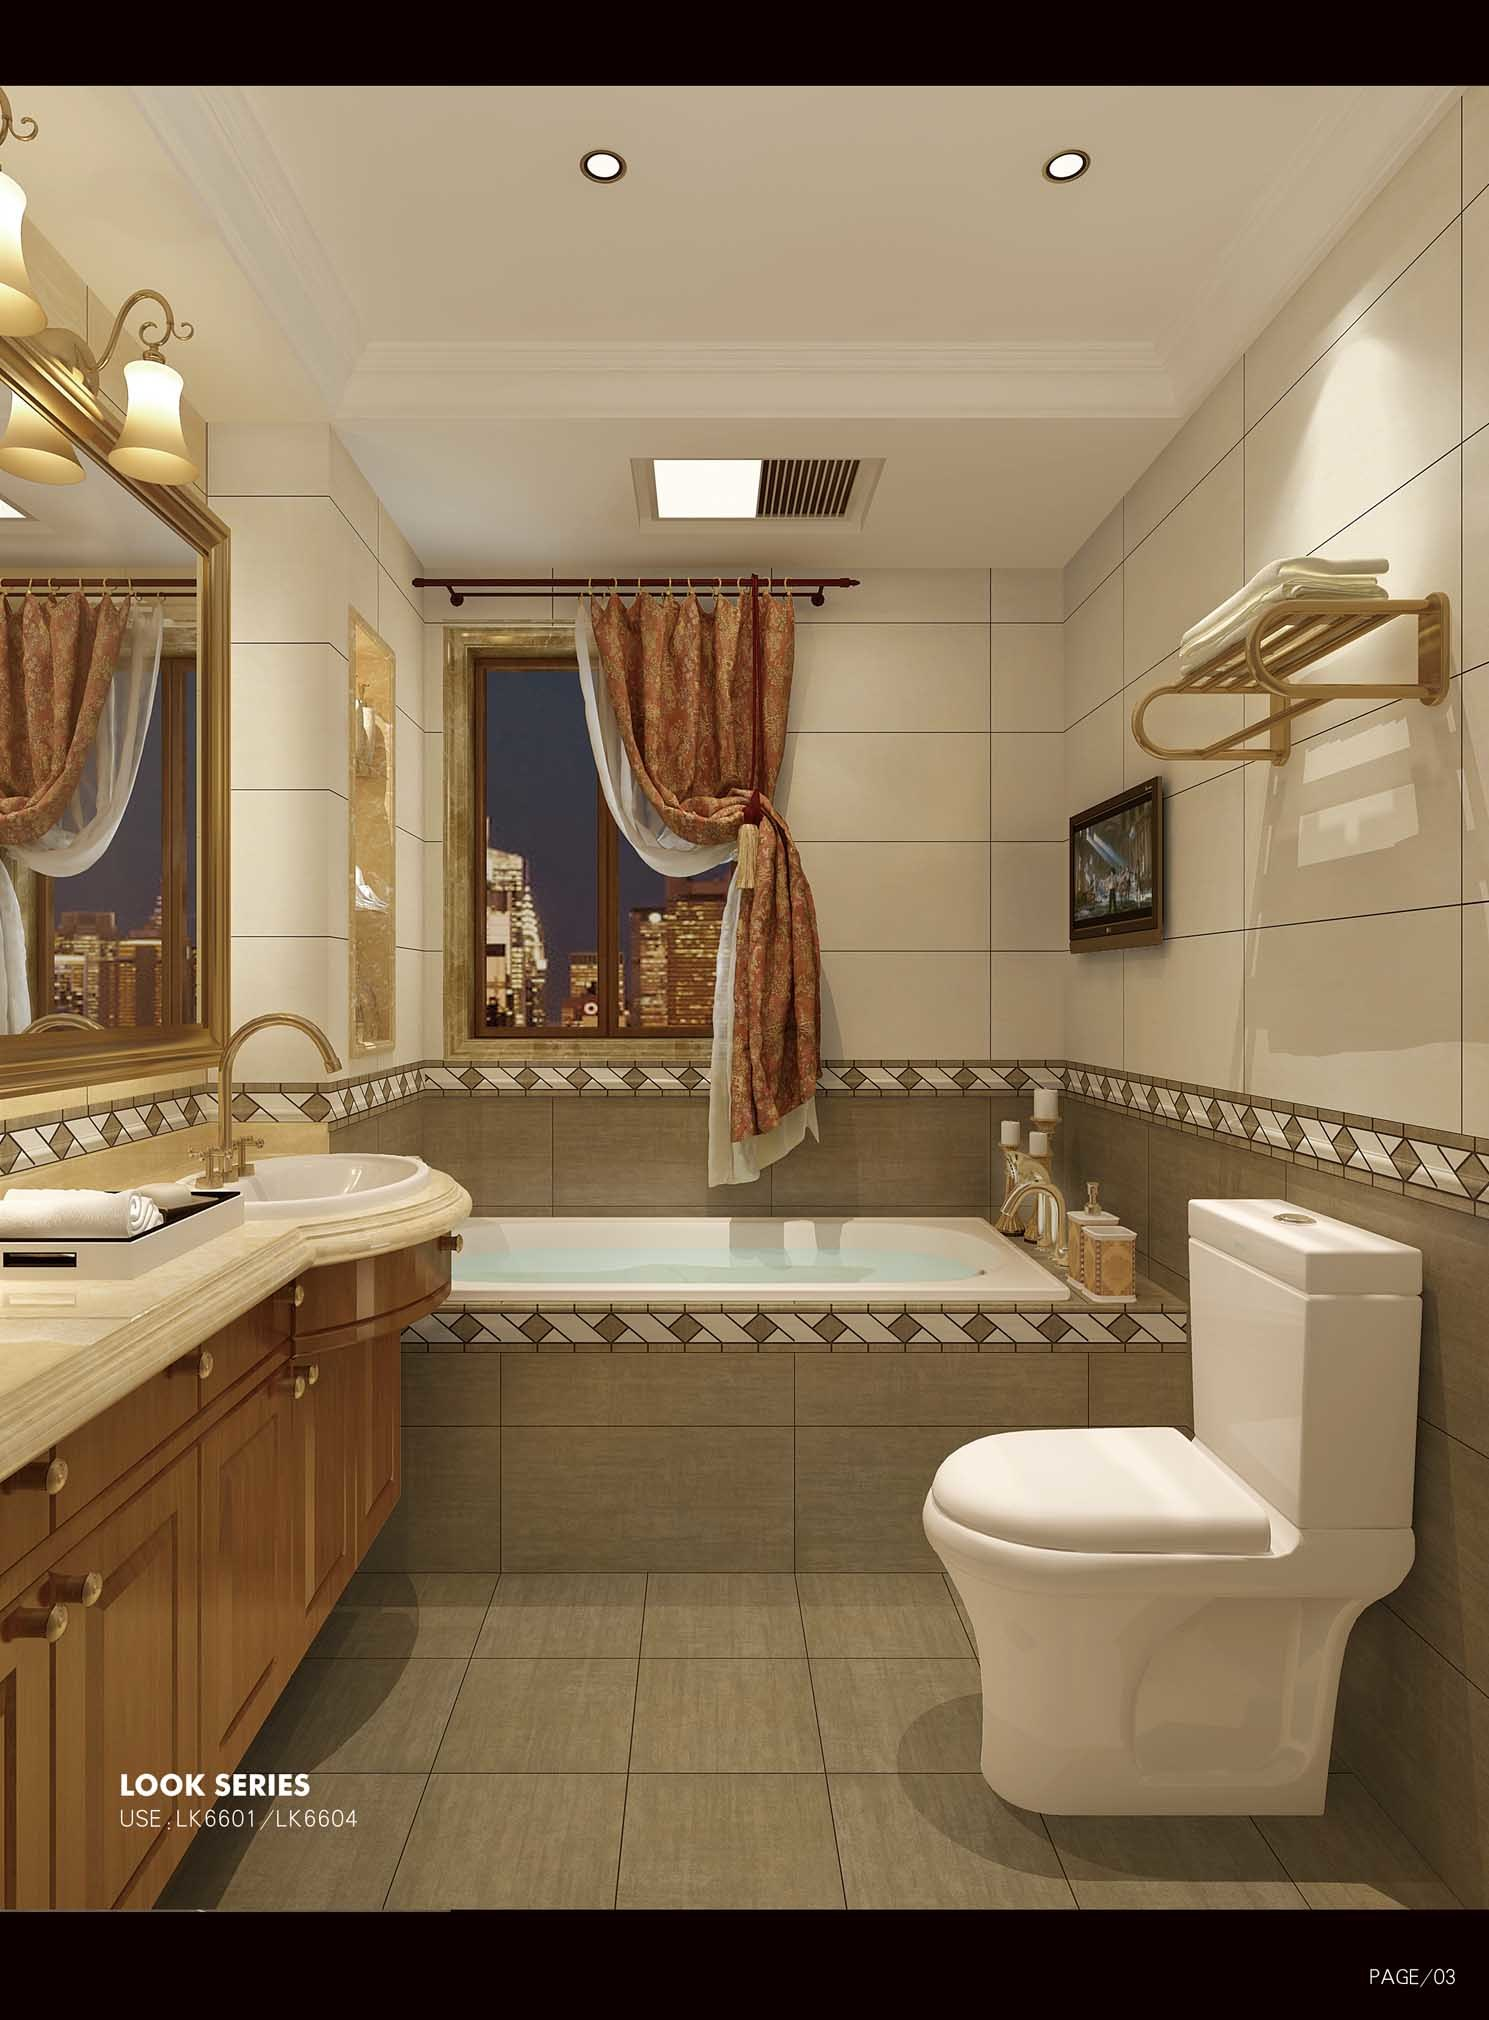 Building Material Porcelain Tiles Floor Tile 600*600mm Anti-Slip Rustic White Color Tile